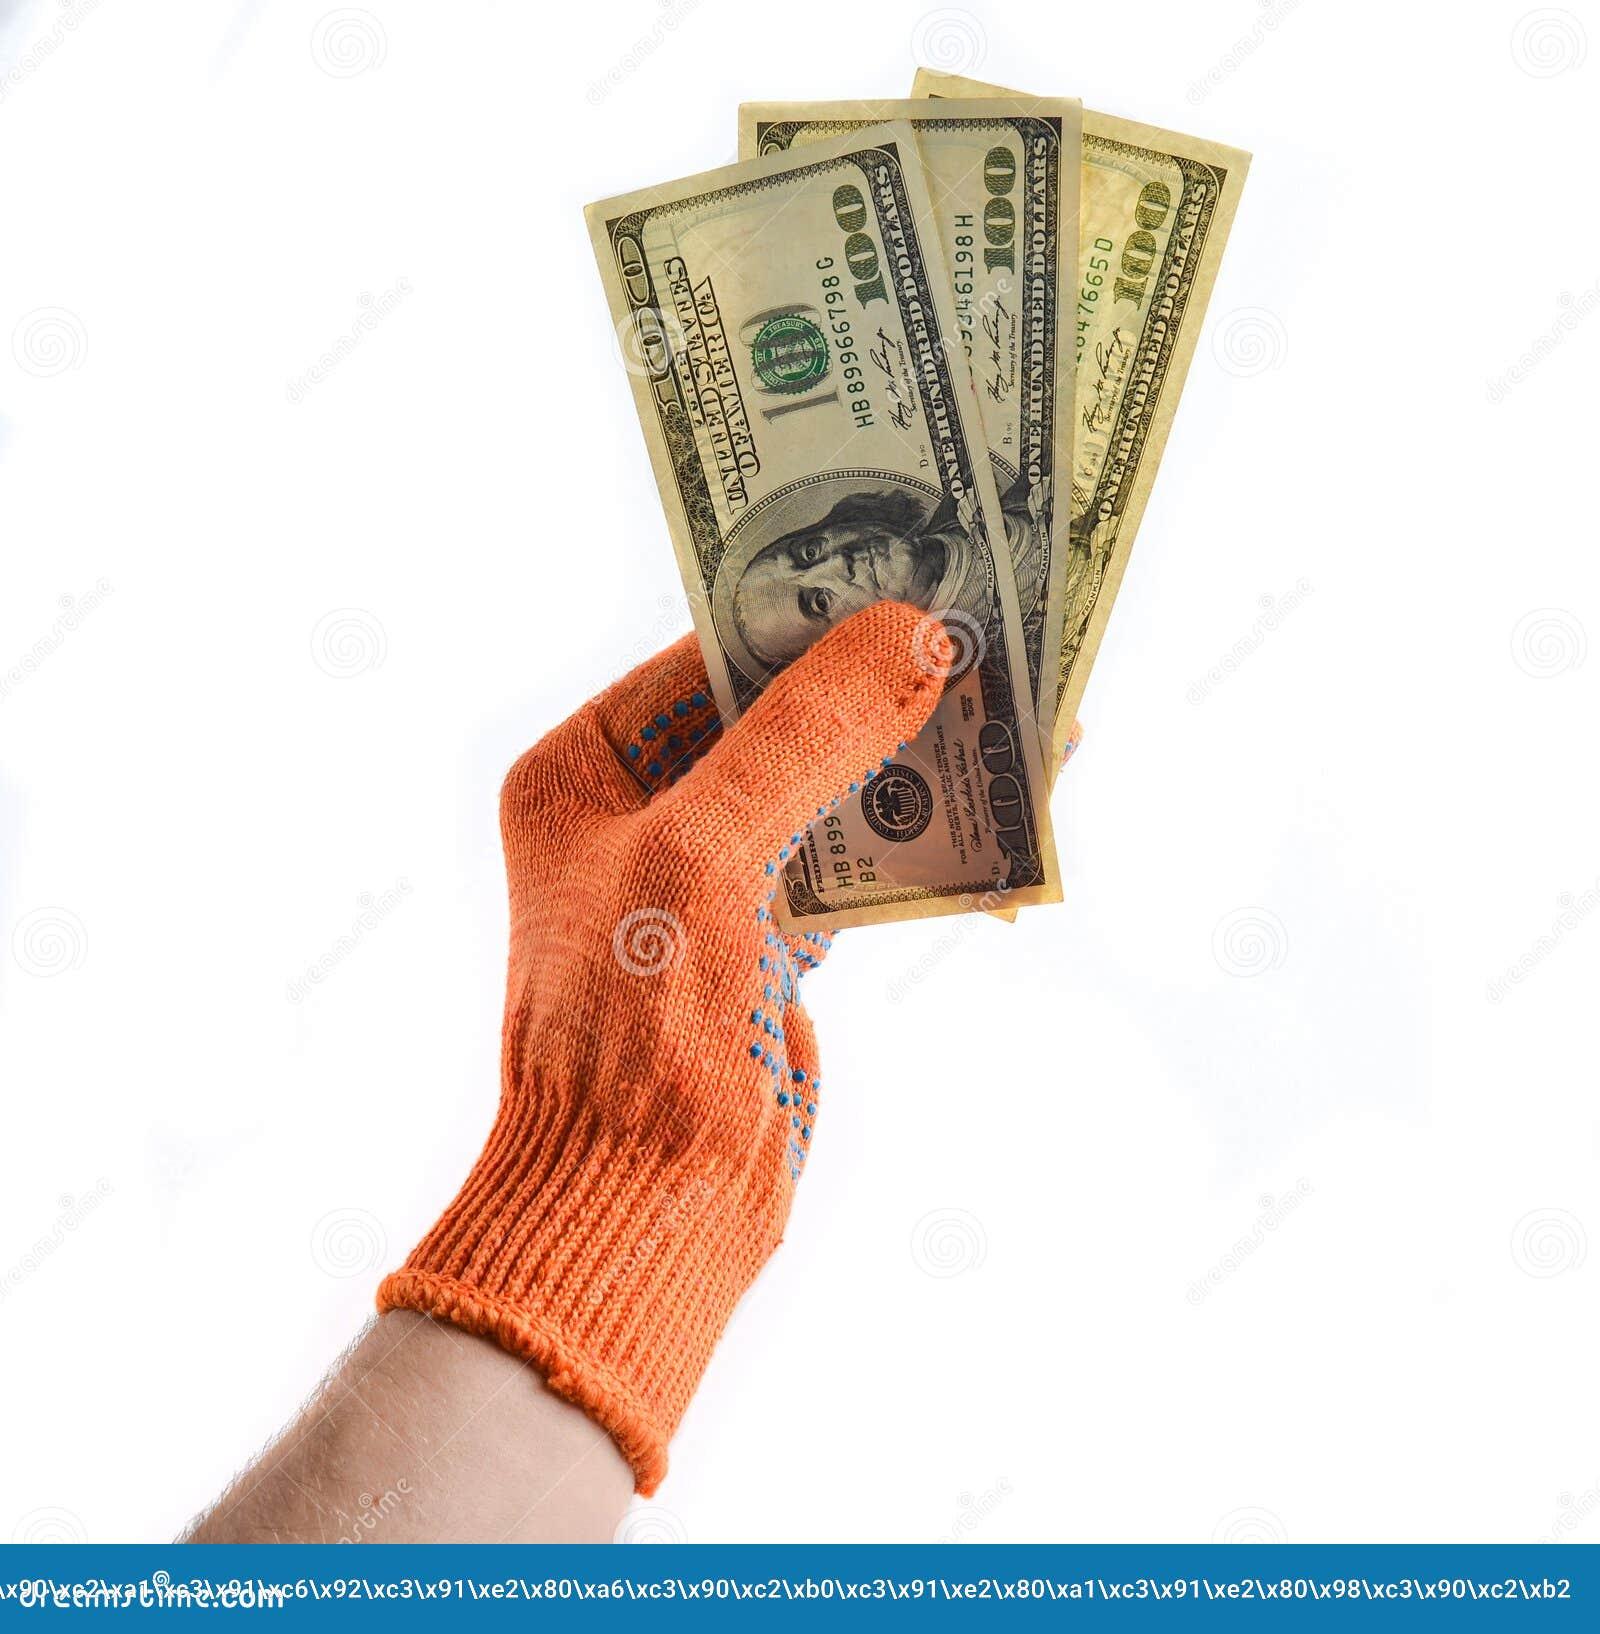 men x27s hands with orange work gloves hold hundred